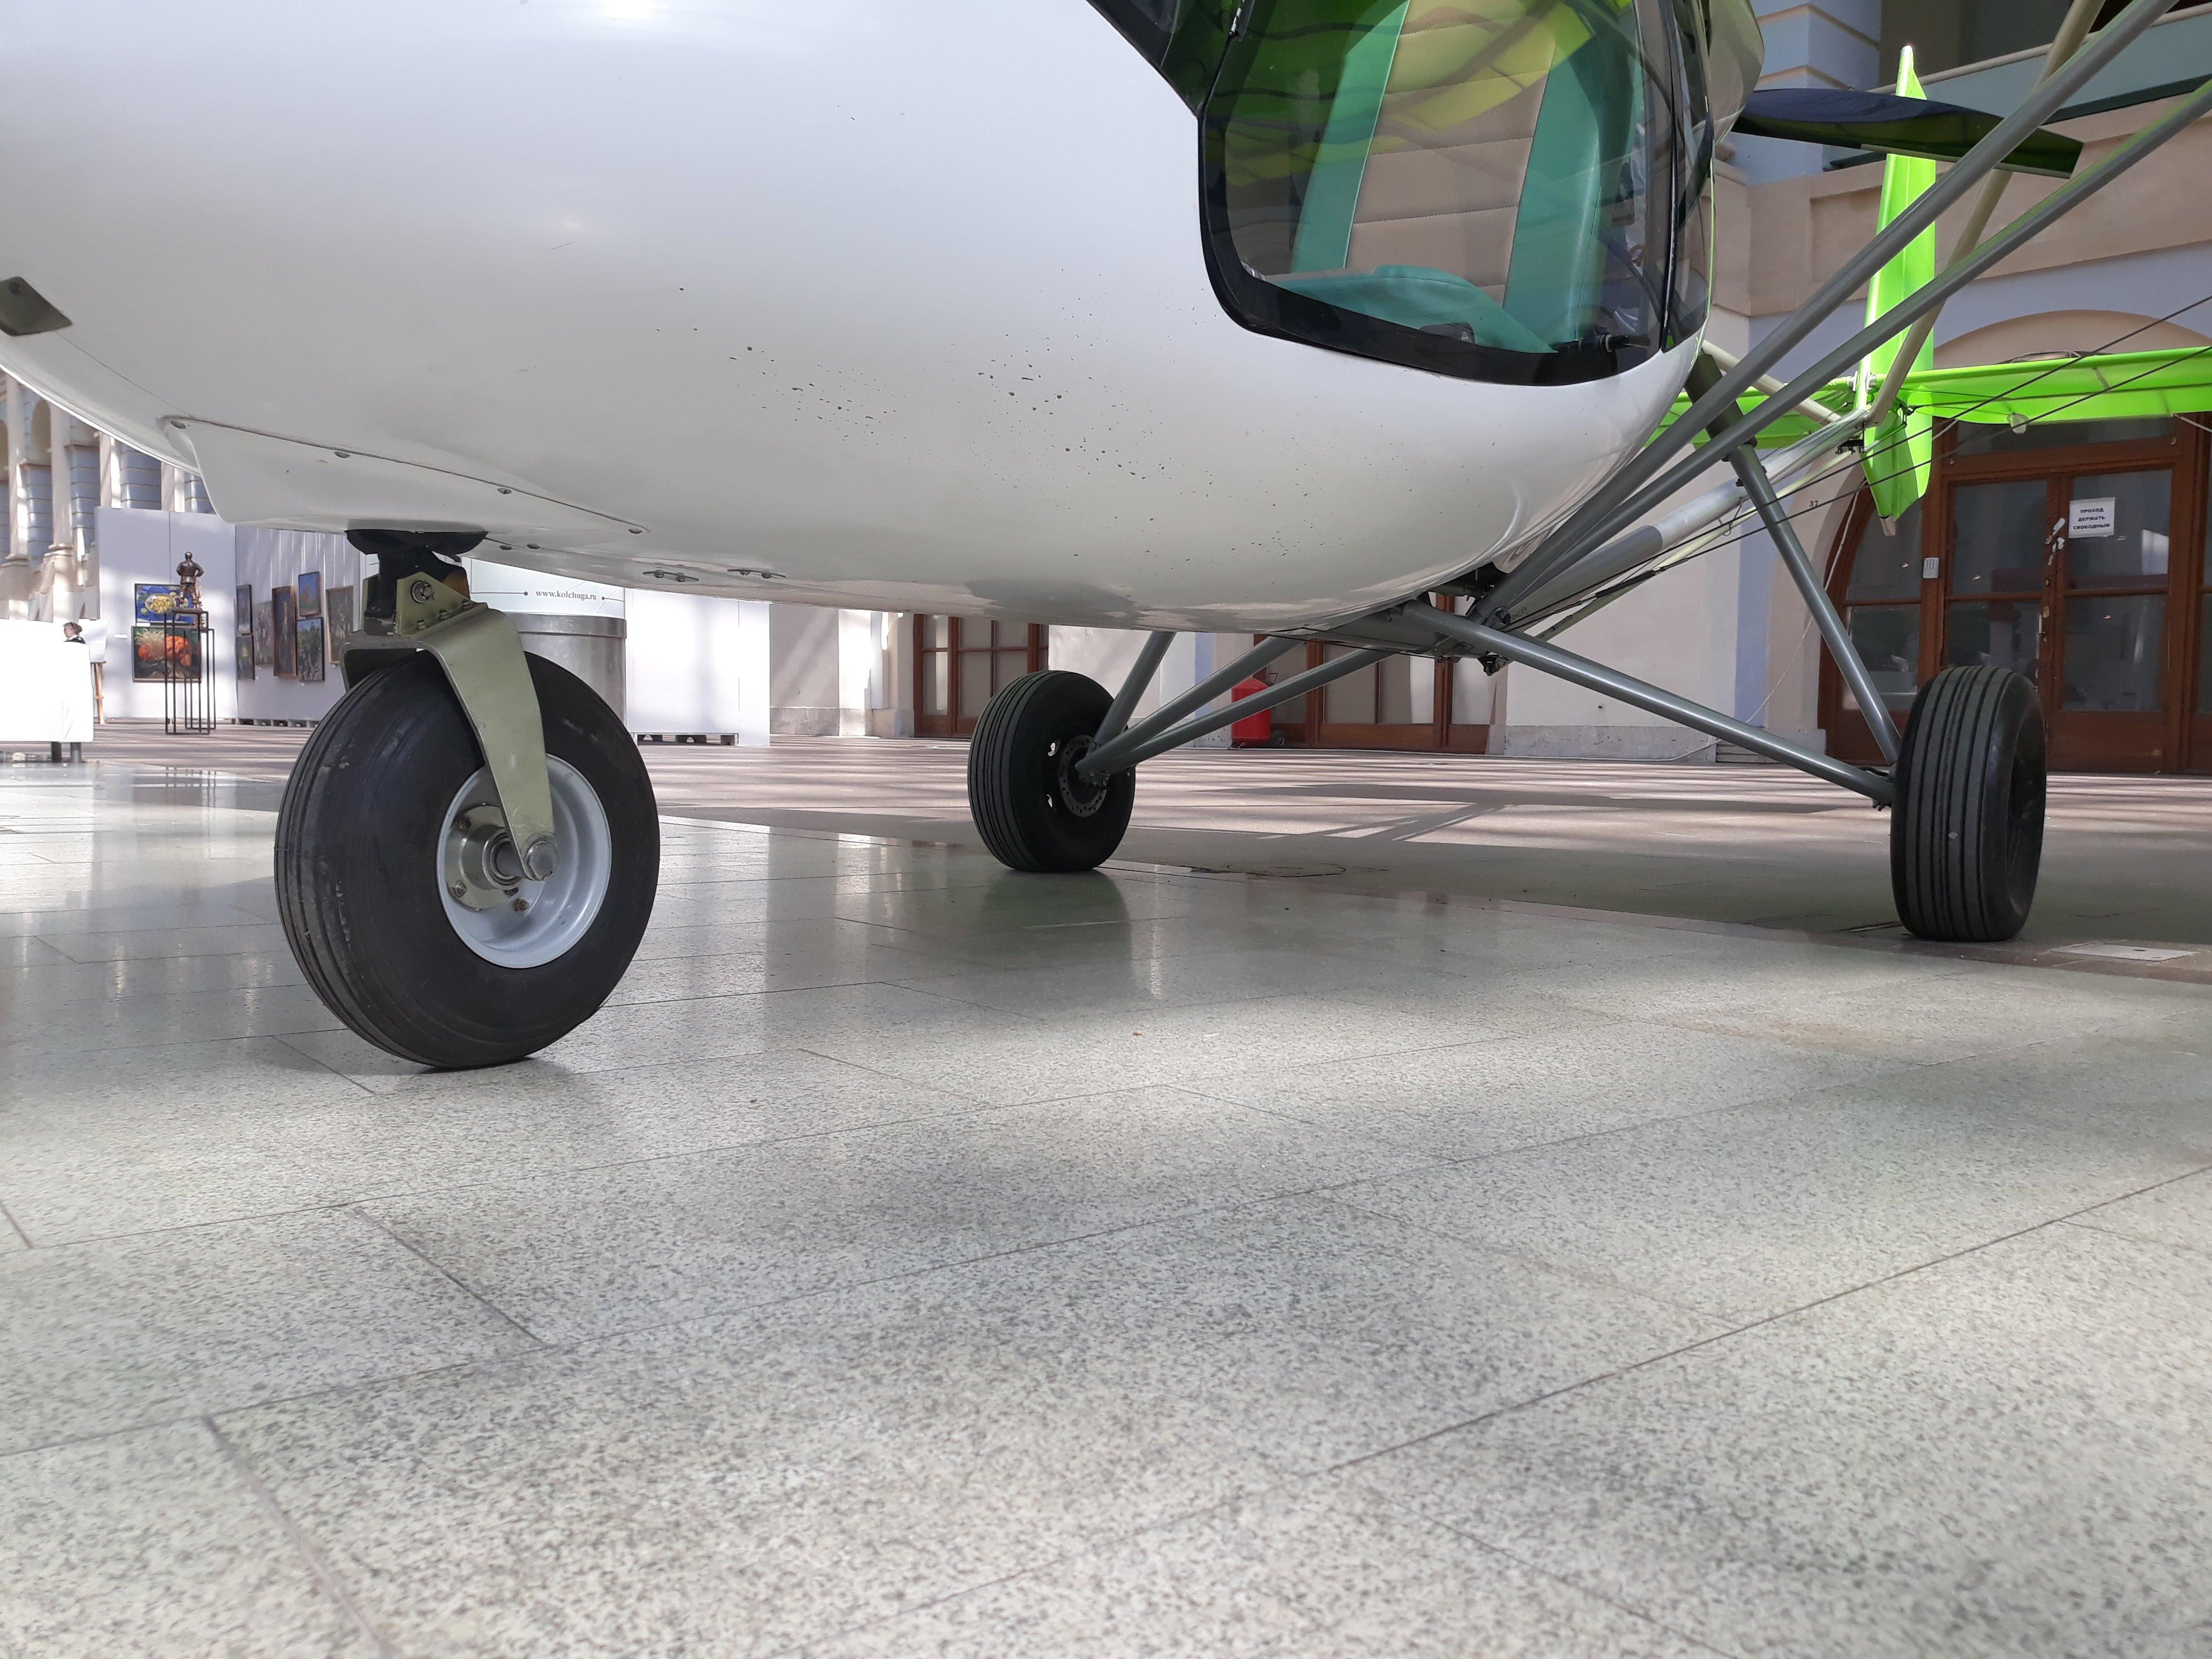 Ультралёгкий самолёт Птенец-3 шасси